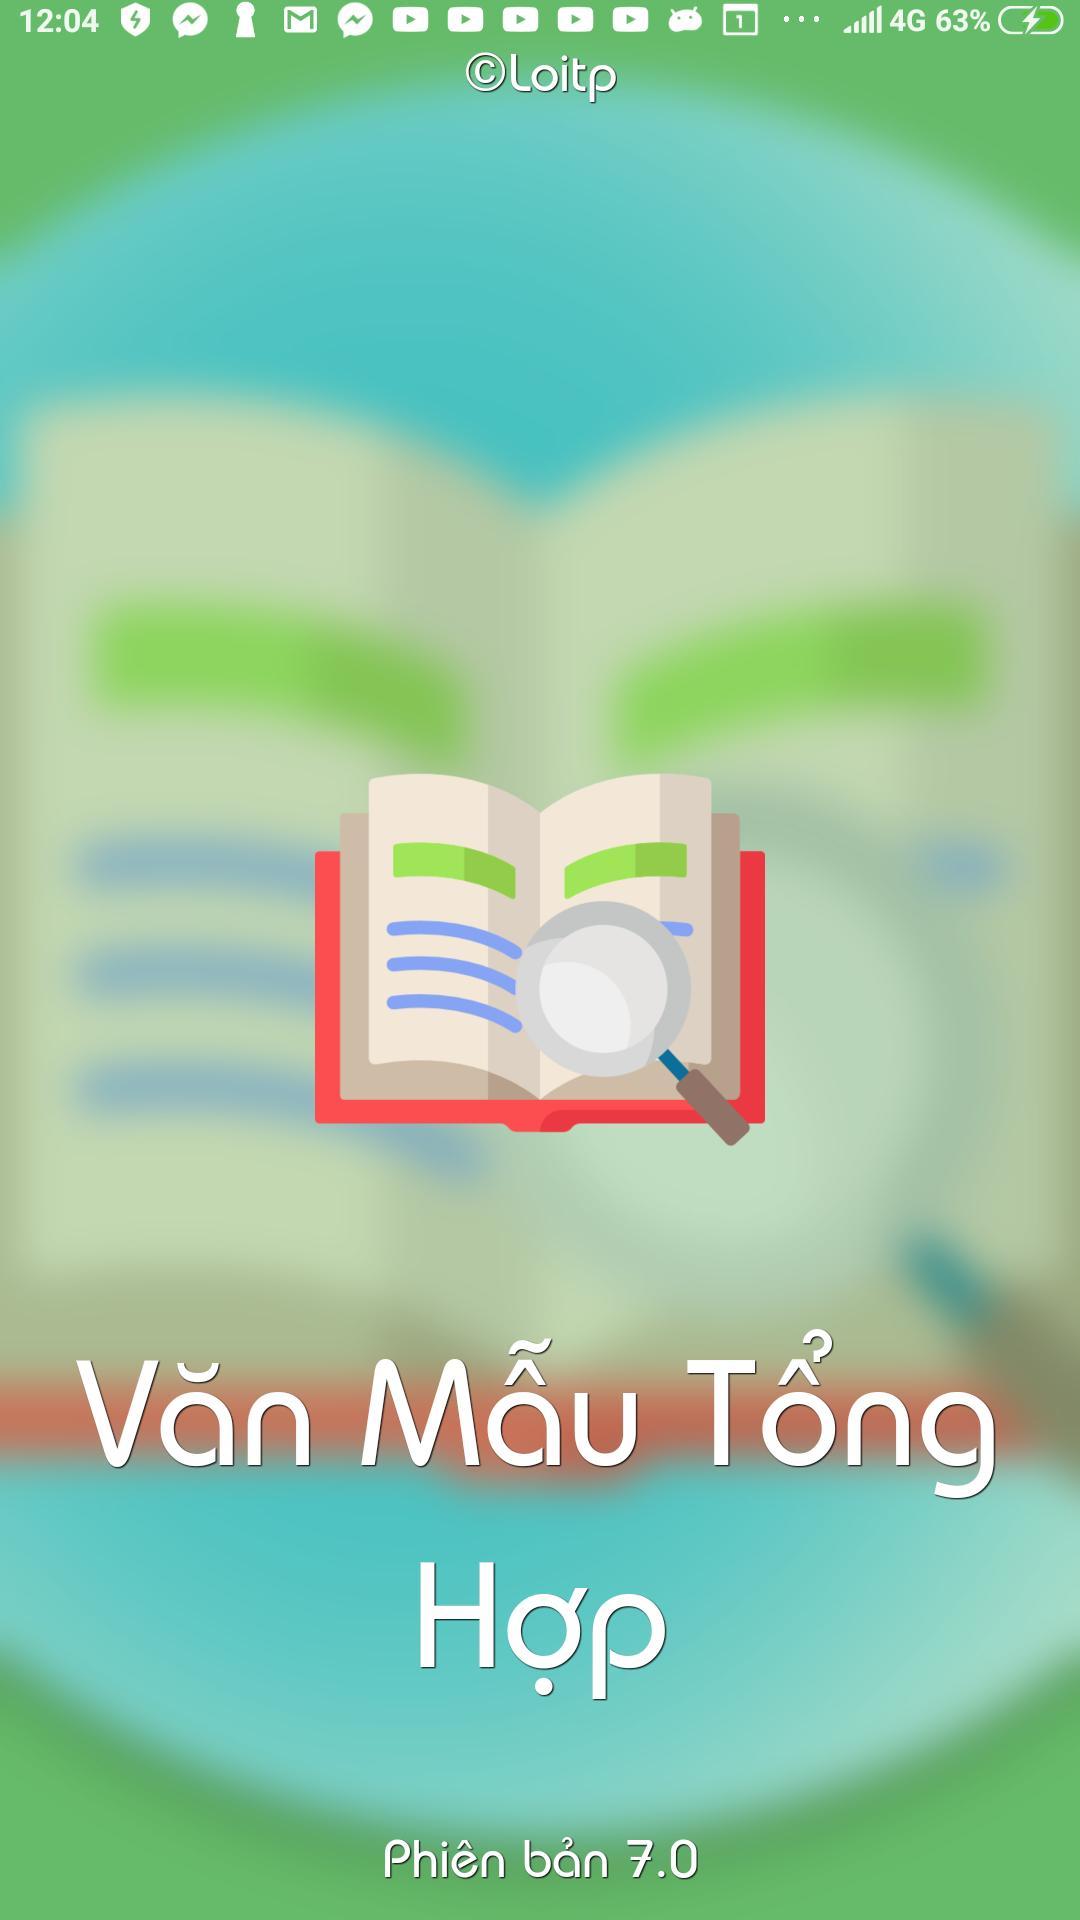 Van Mau Tong Hop Tron Bo - Cap 1 Cap 2 Cap 3 Full poster